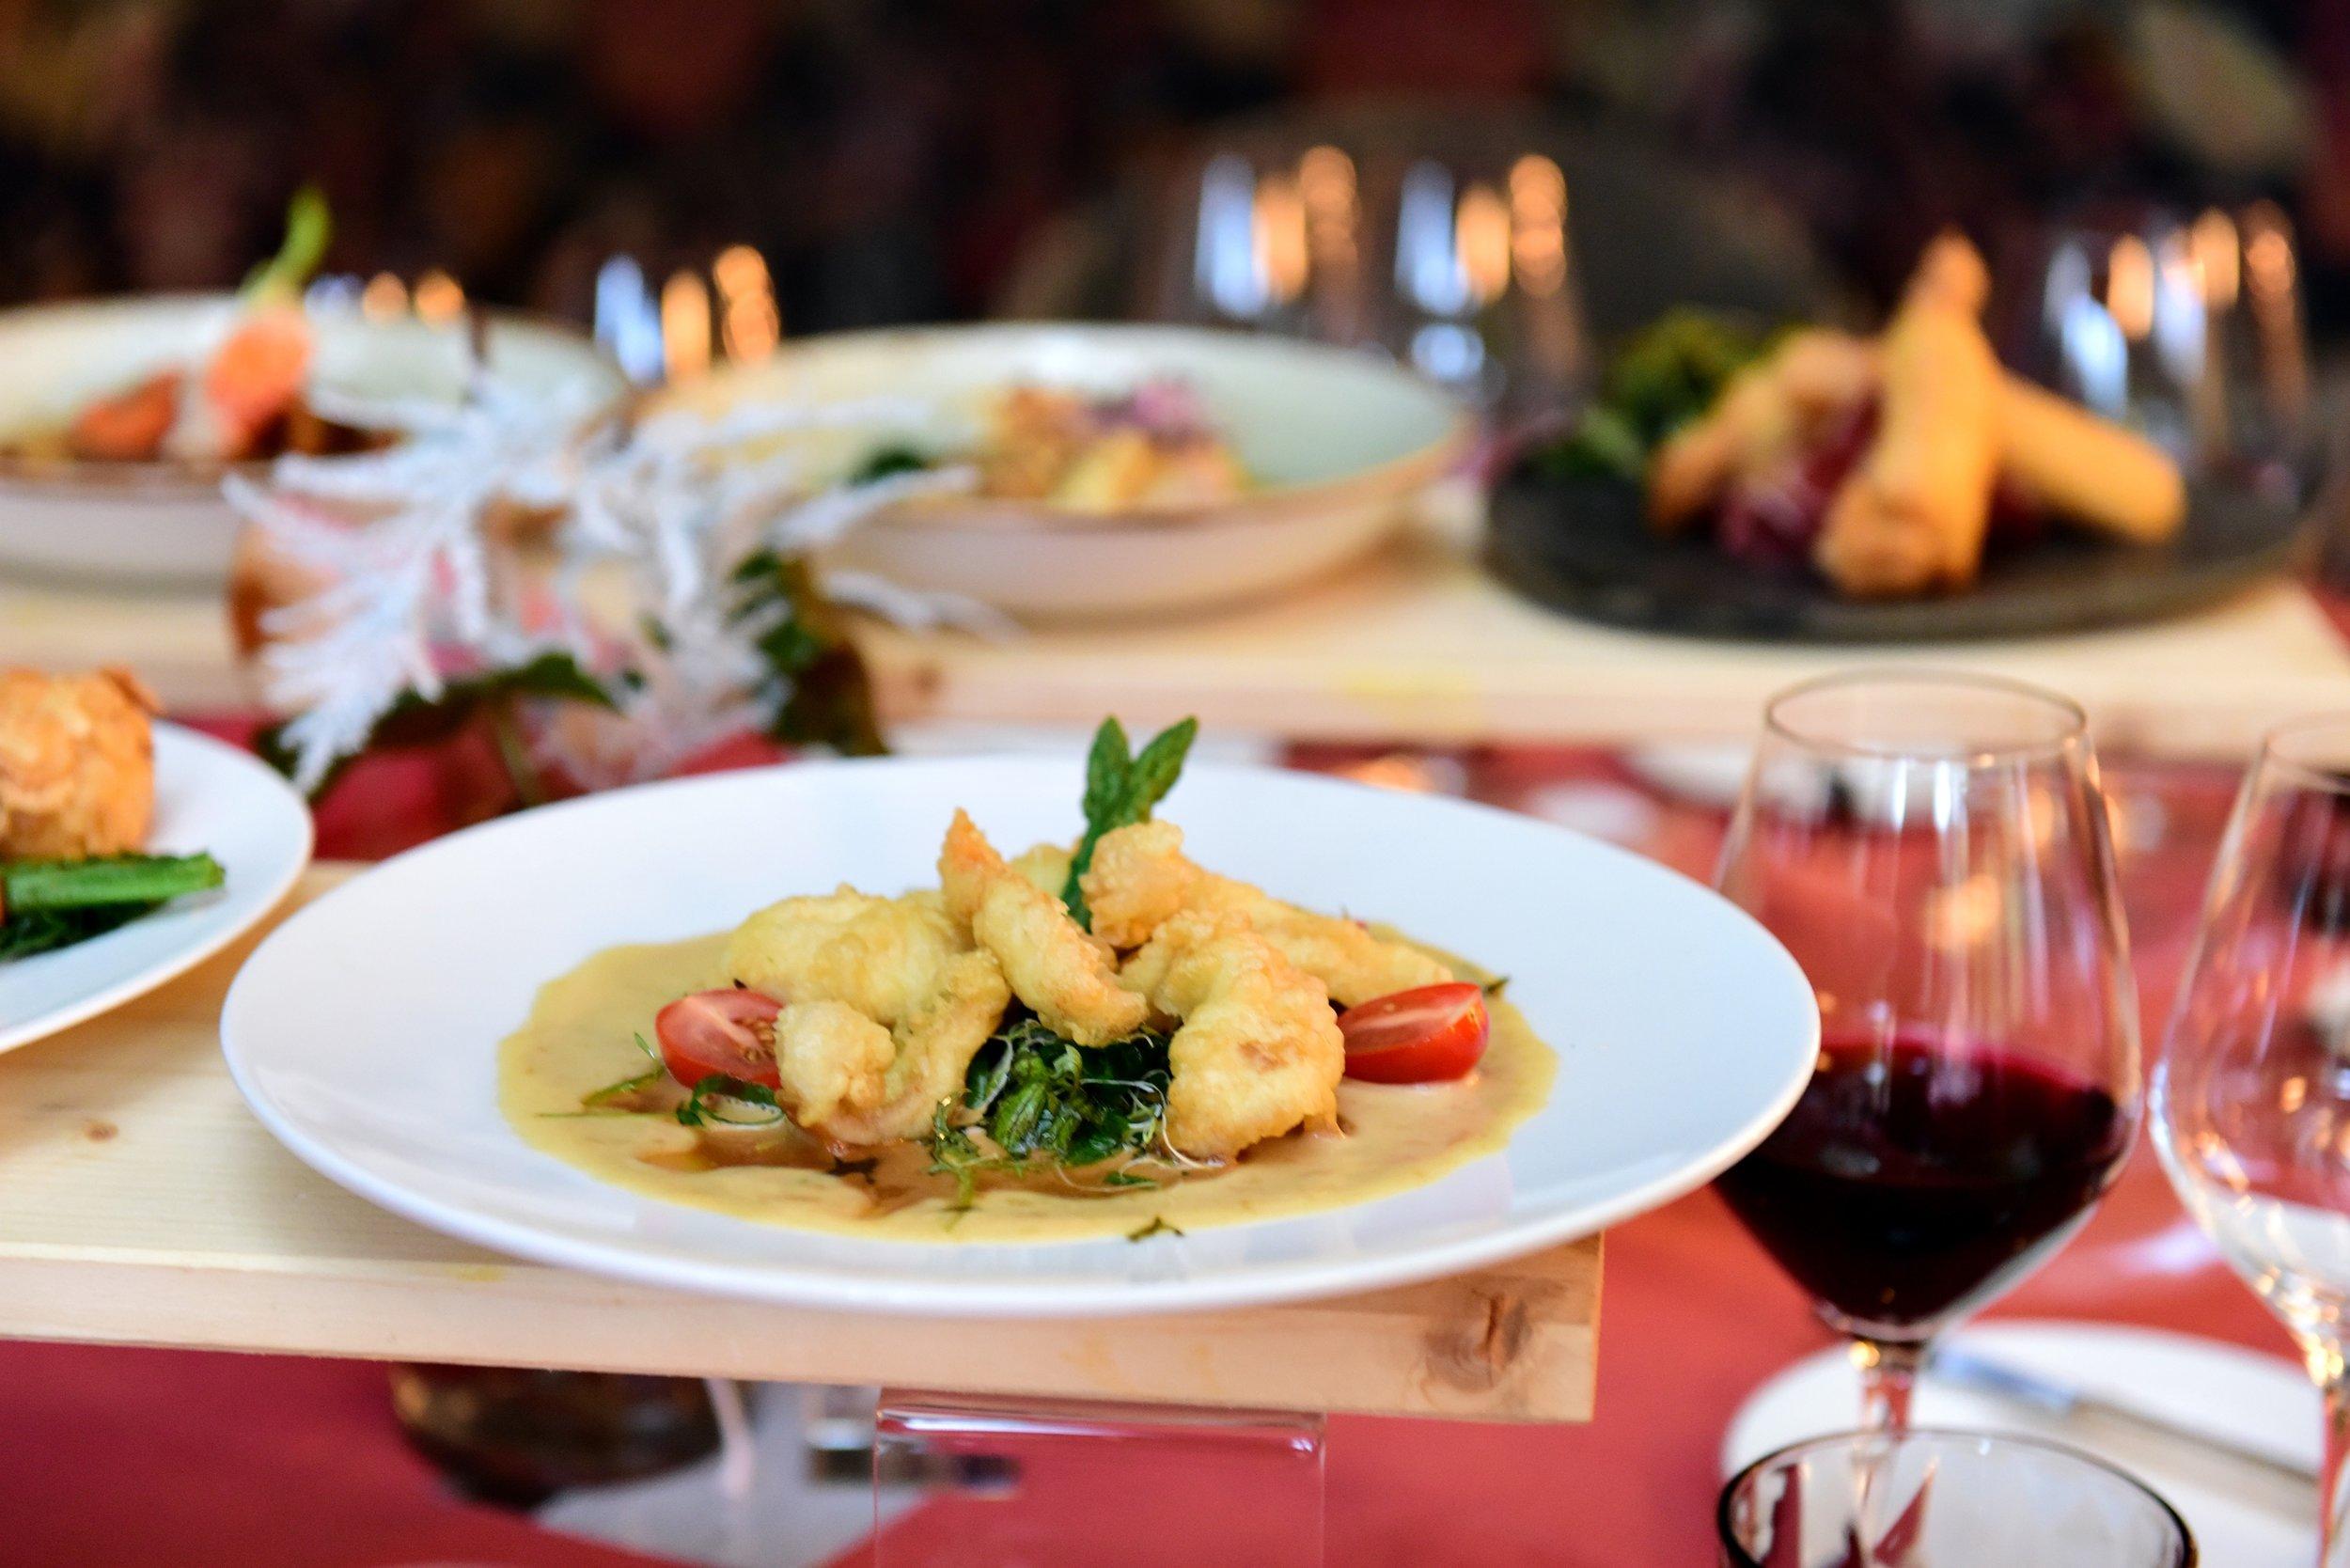 16 restaurant de mangerie lauwe tablefever bart albrecht .jpg